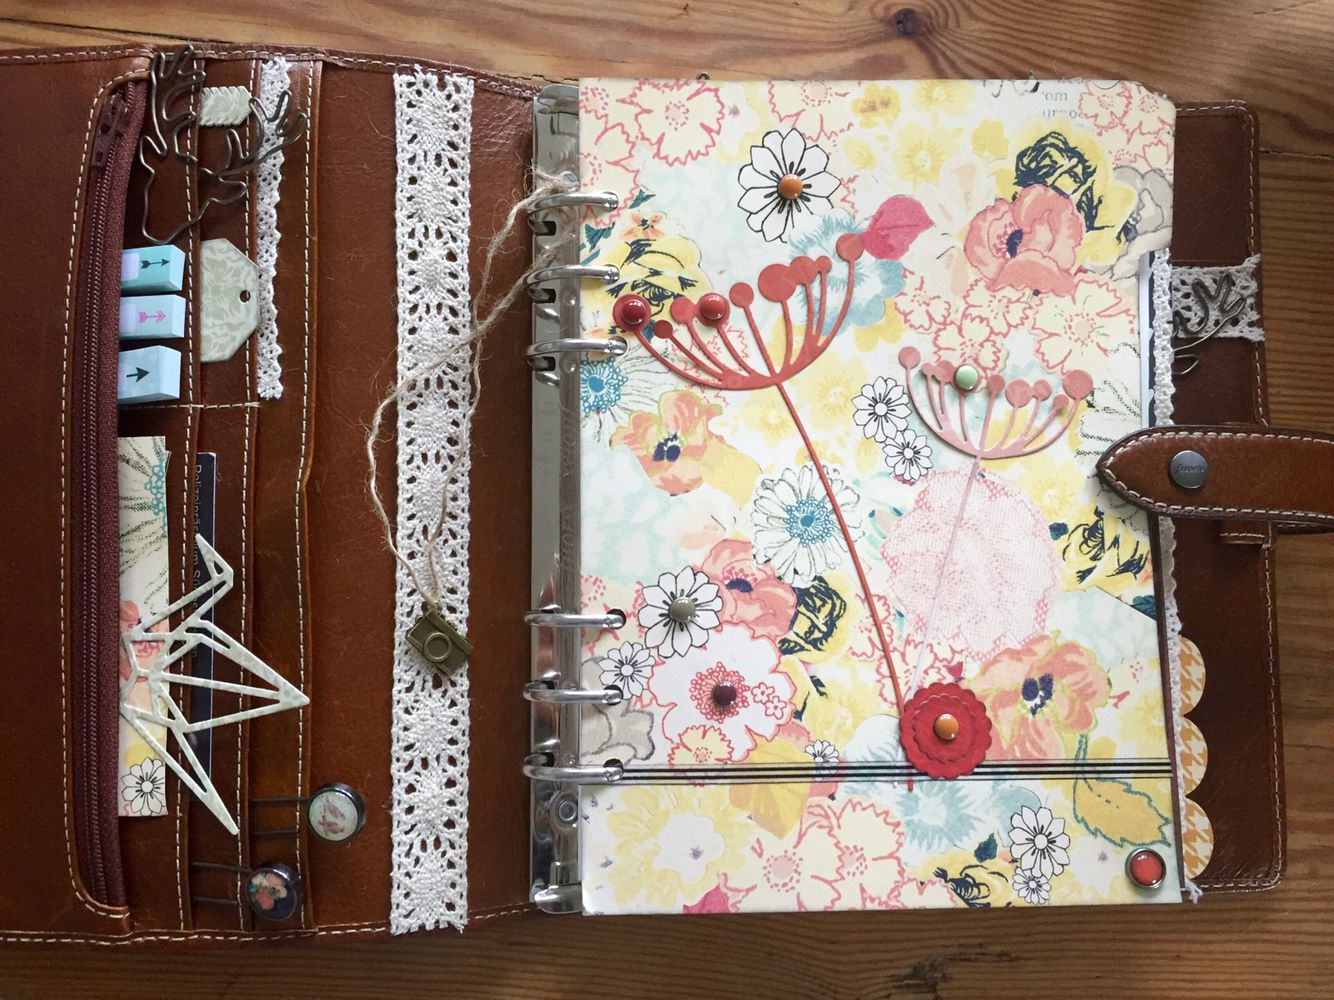 Filofax Ideen.My New Filofax Decoration Ideas Malden Ochre A5 I Love It